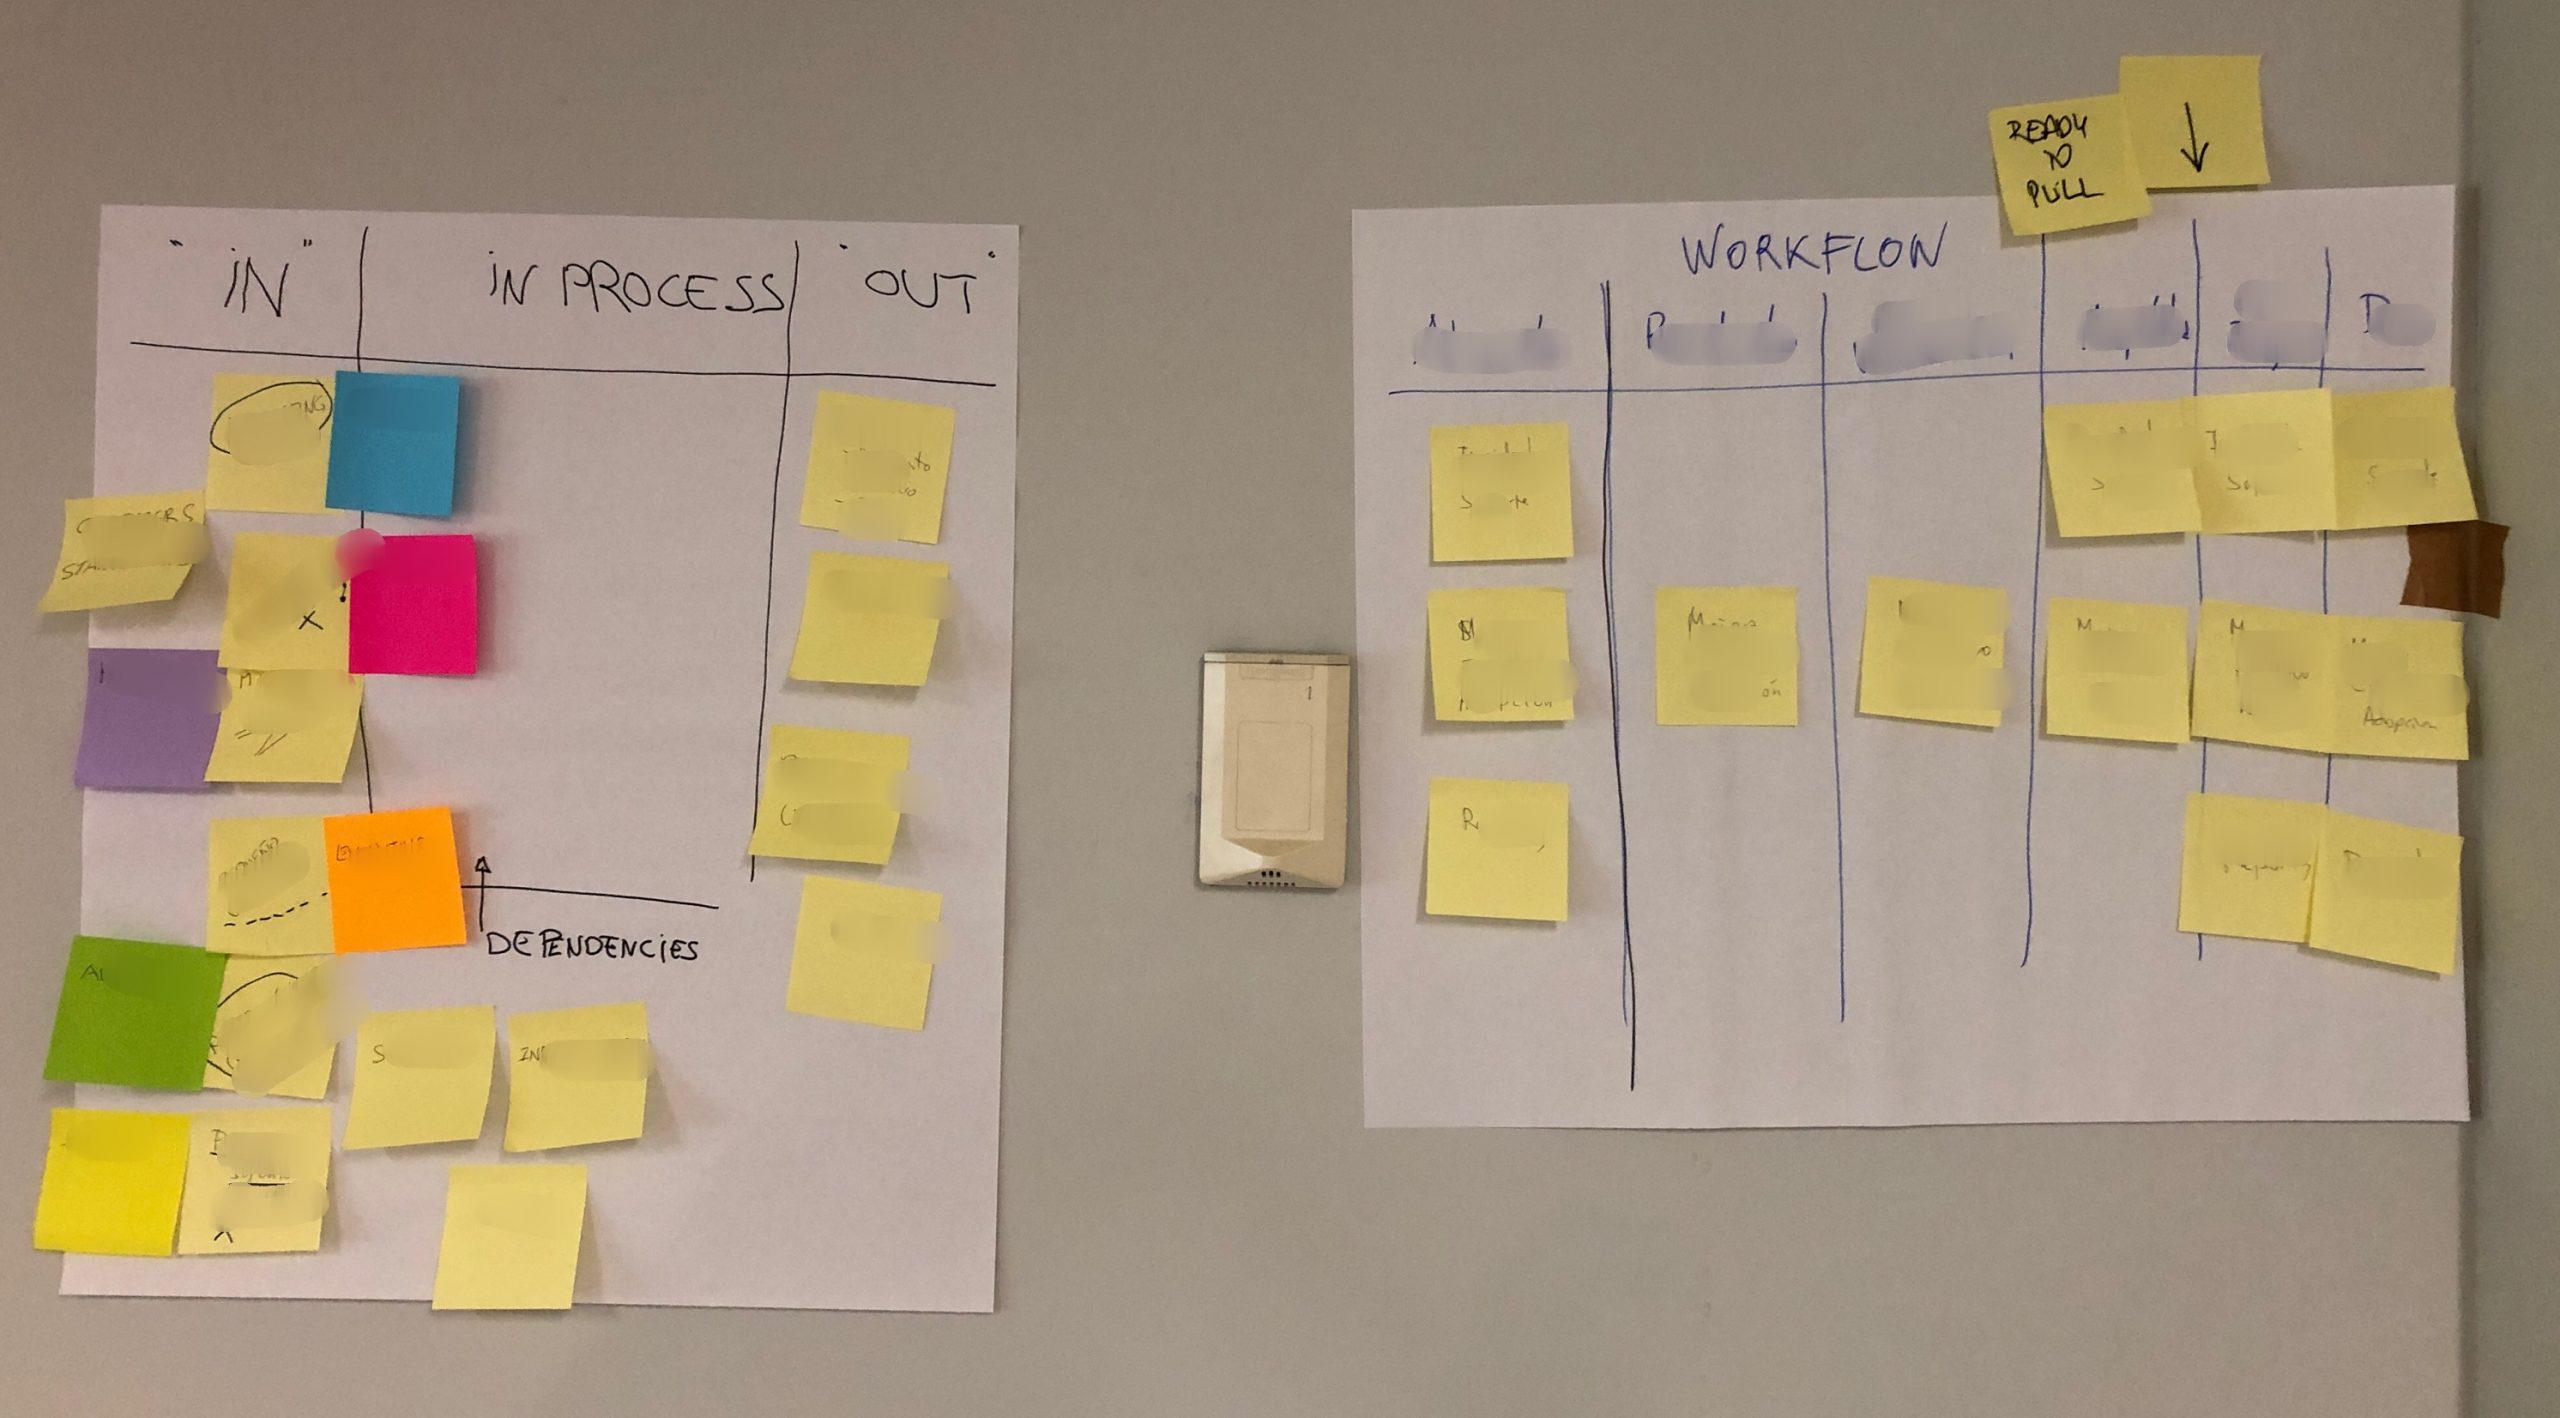 Kanban System Design - Modeling Workflow - AKTIA Solutions